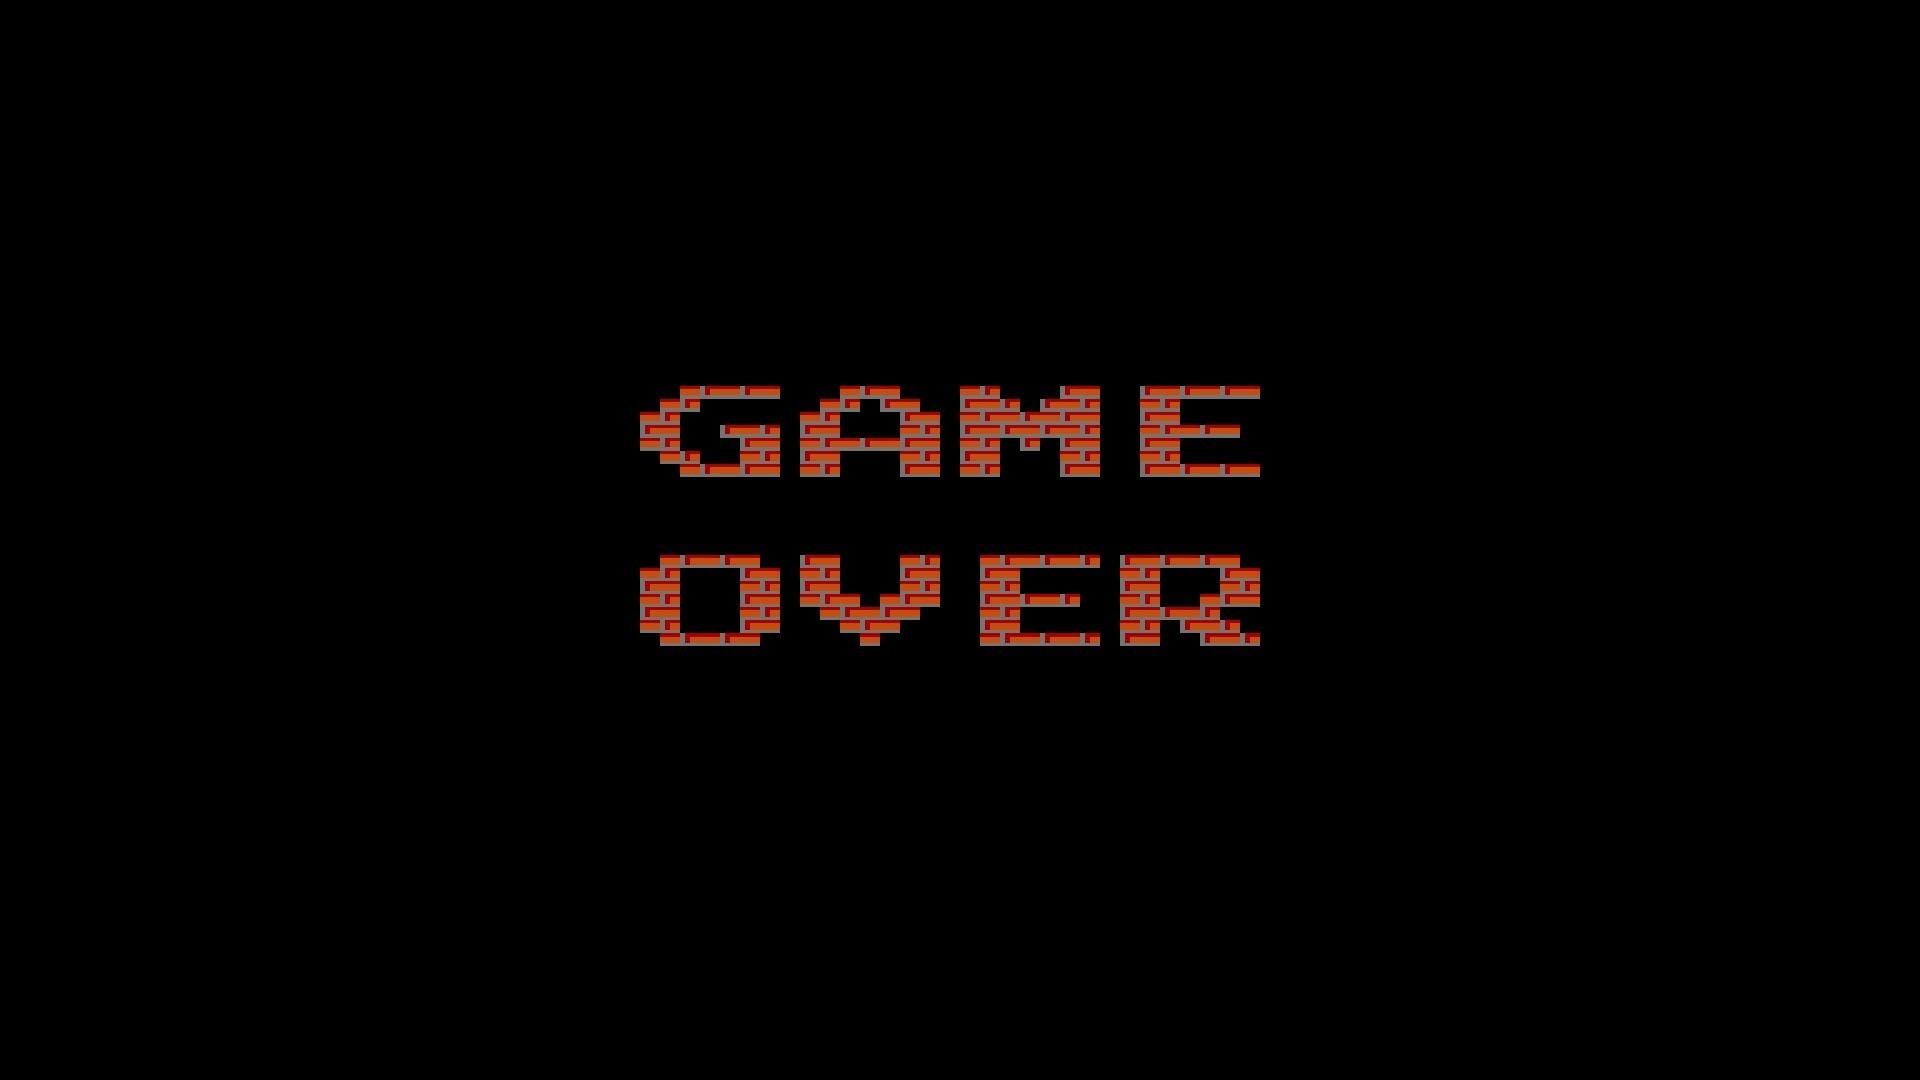 digital Art, GAME OVER, Minimalism, Text, Video Games, Retro Games,